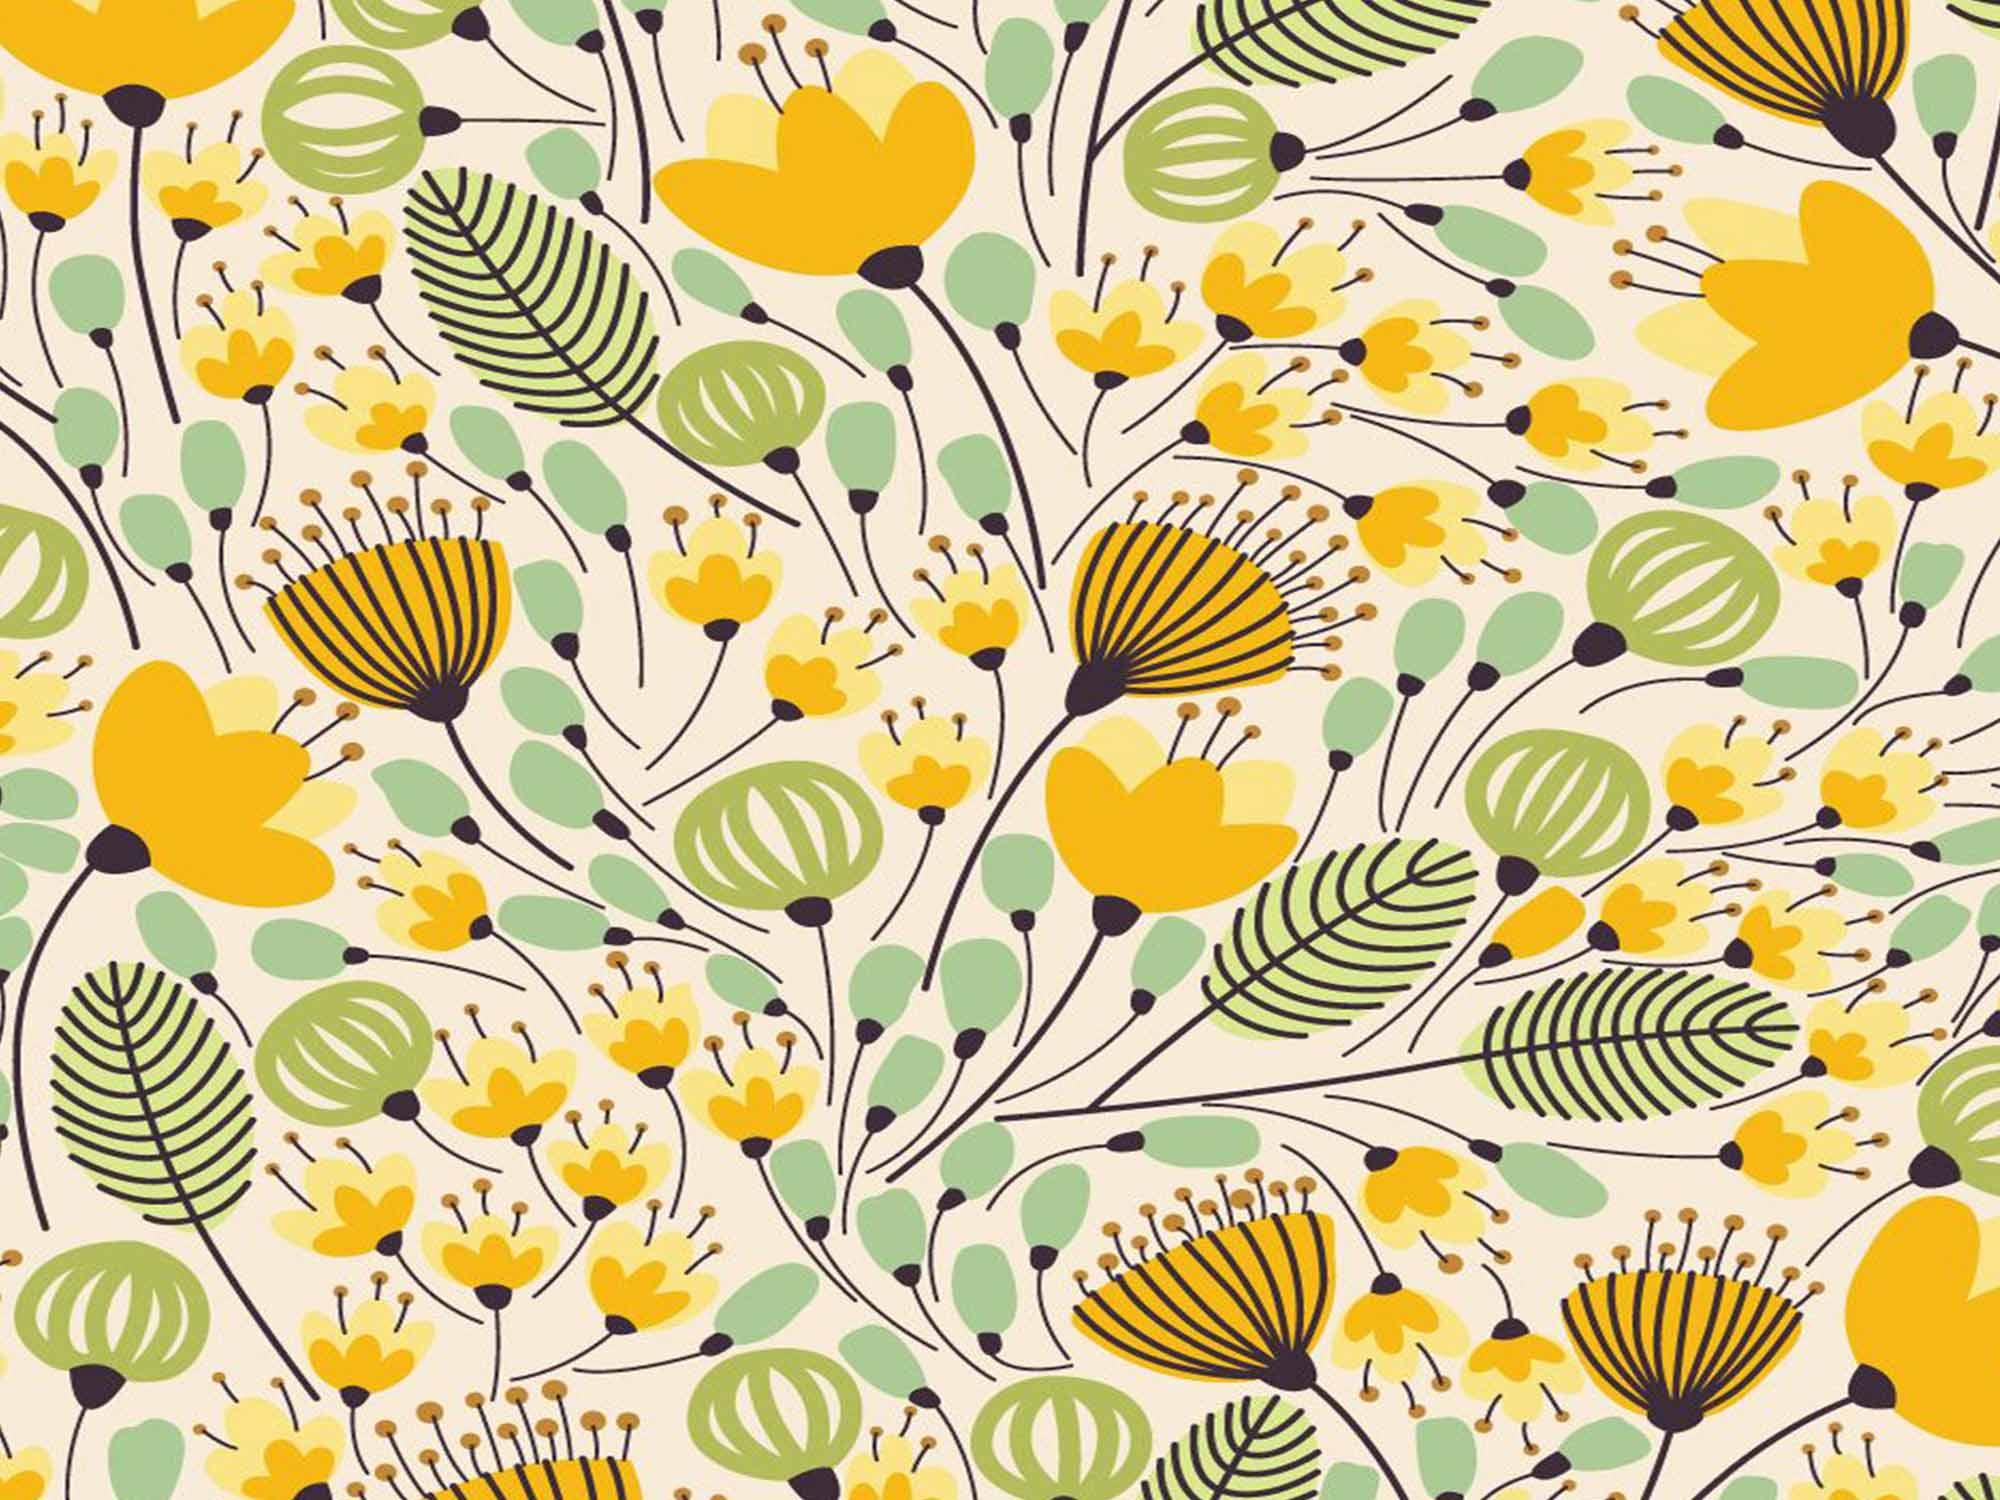 Papel de Parede Floral 0062 - Adesivos de Parede  - Paredes Decoradas